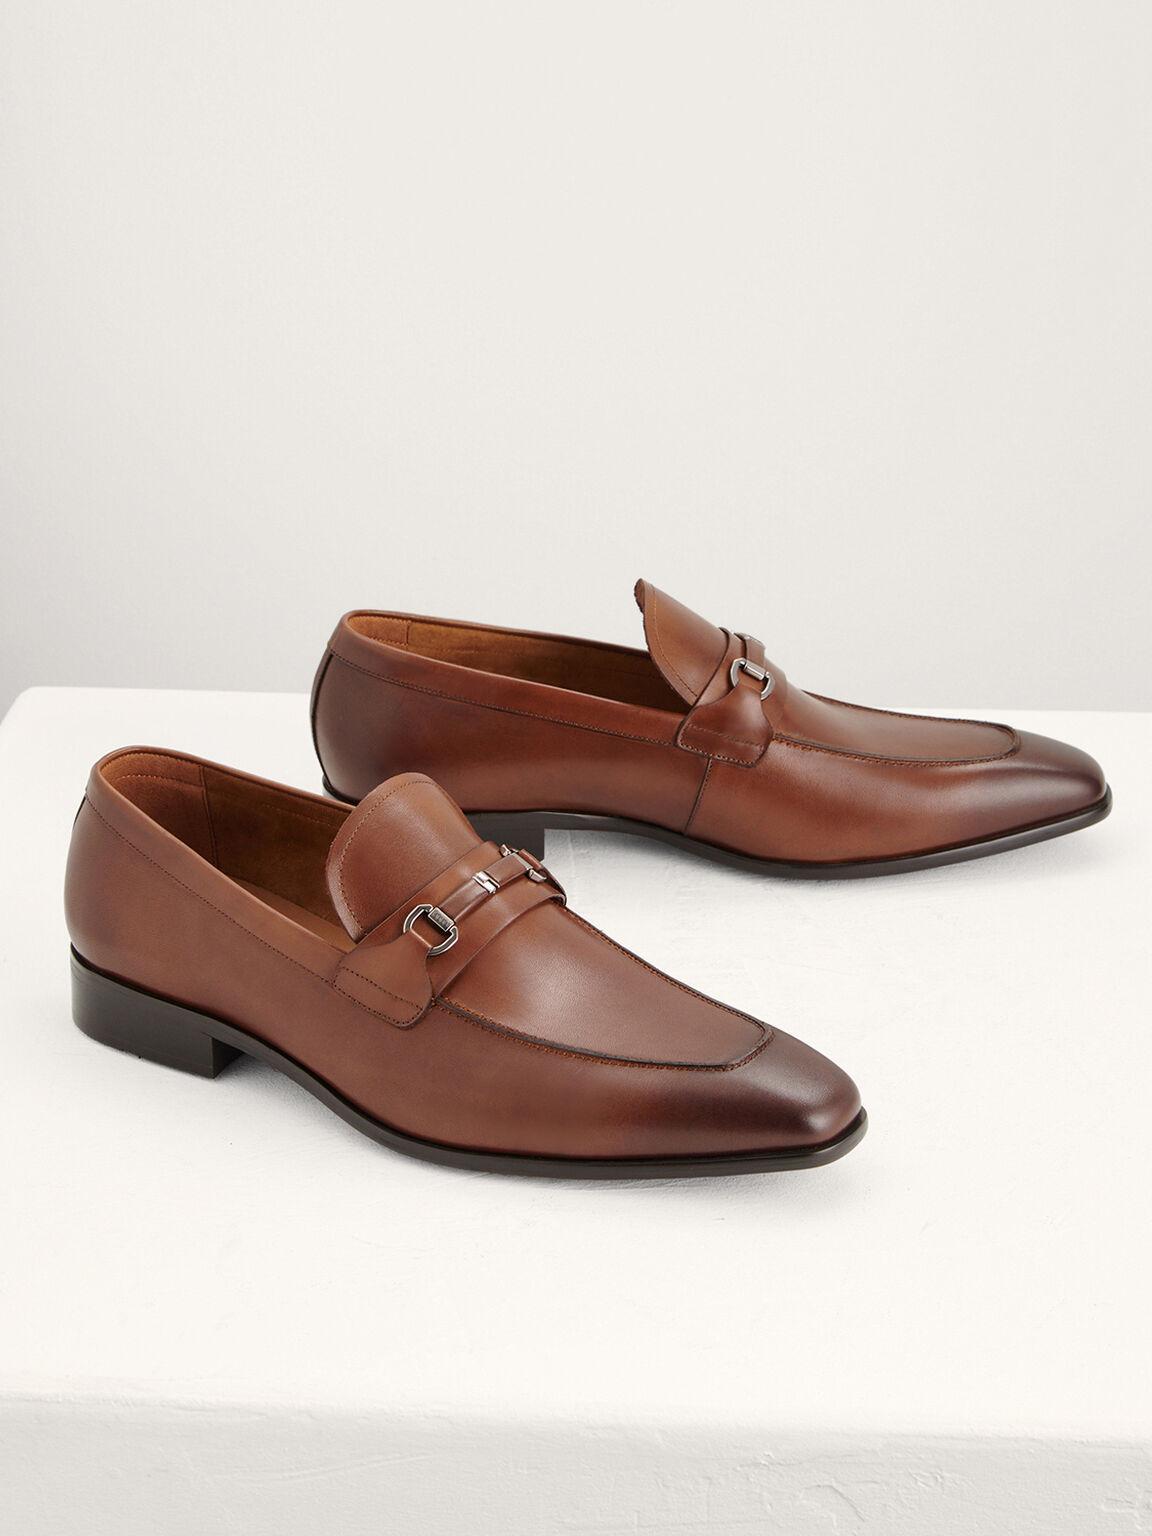 Horsebit Leather Loafers, Light Brown, hi-res